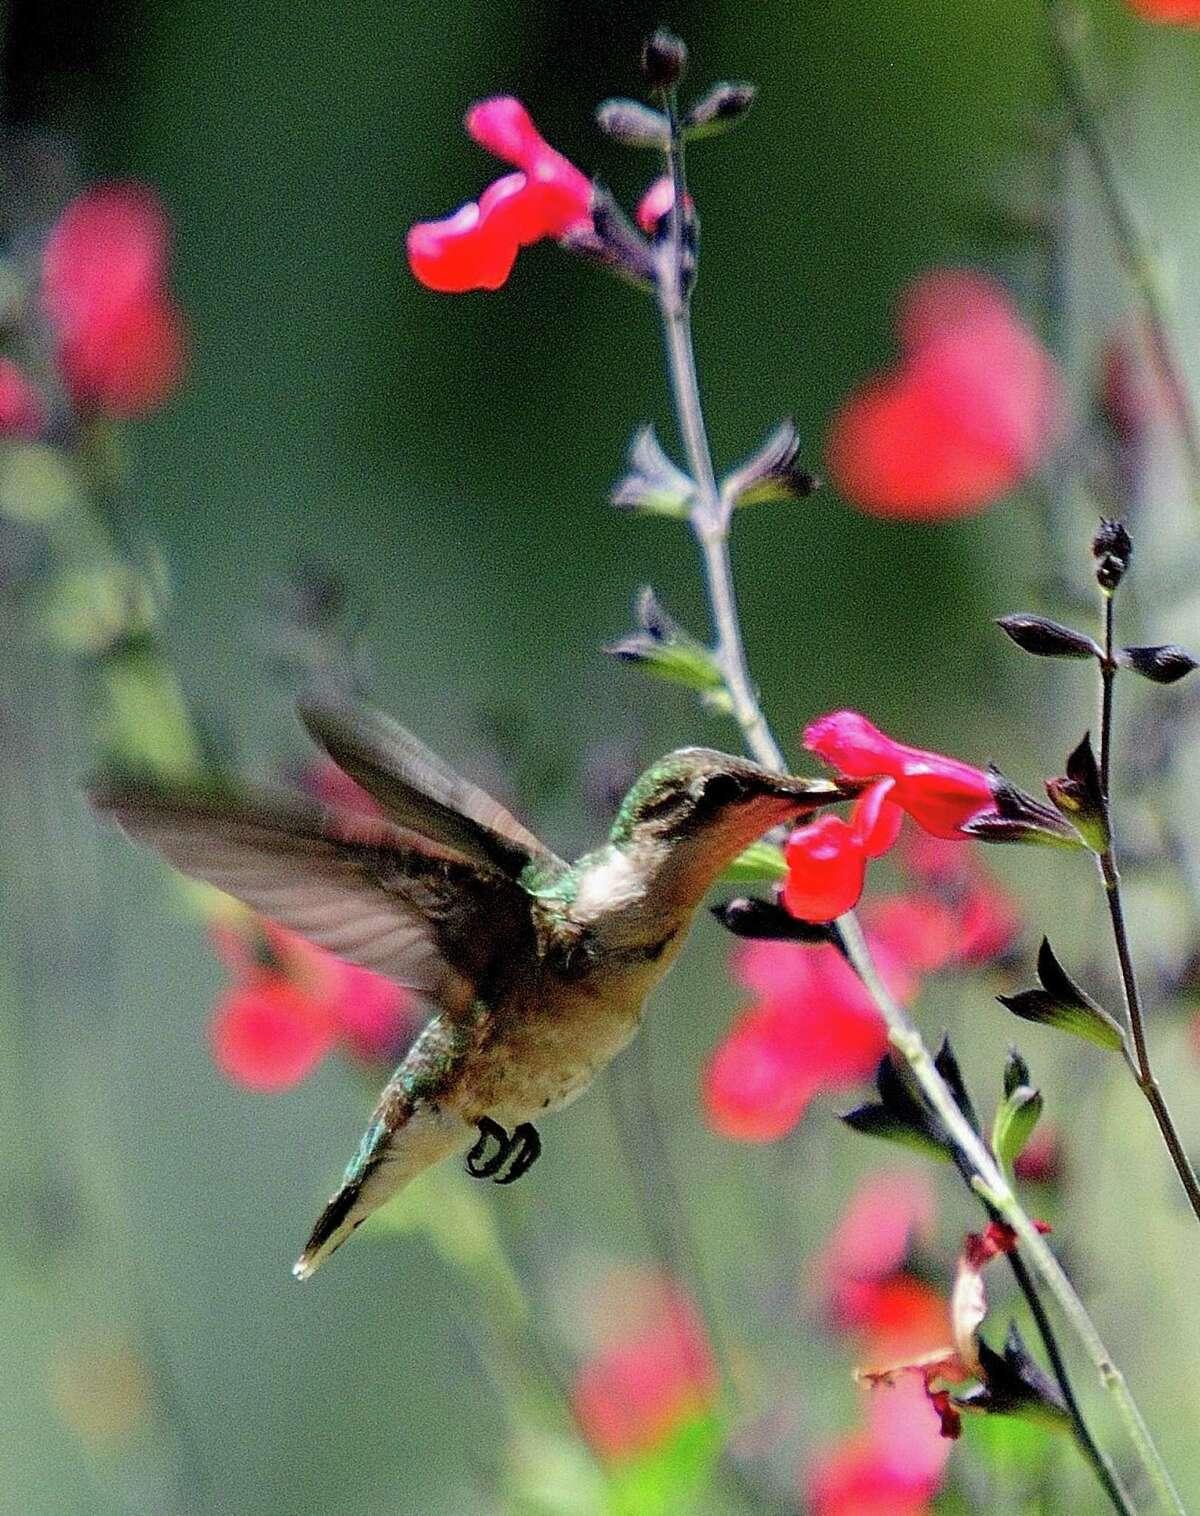 Cherry sage, Salvia greggii blooms all summer bring in pollinators including hummingbirds.